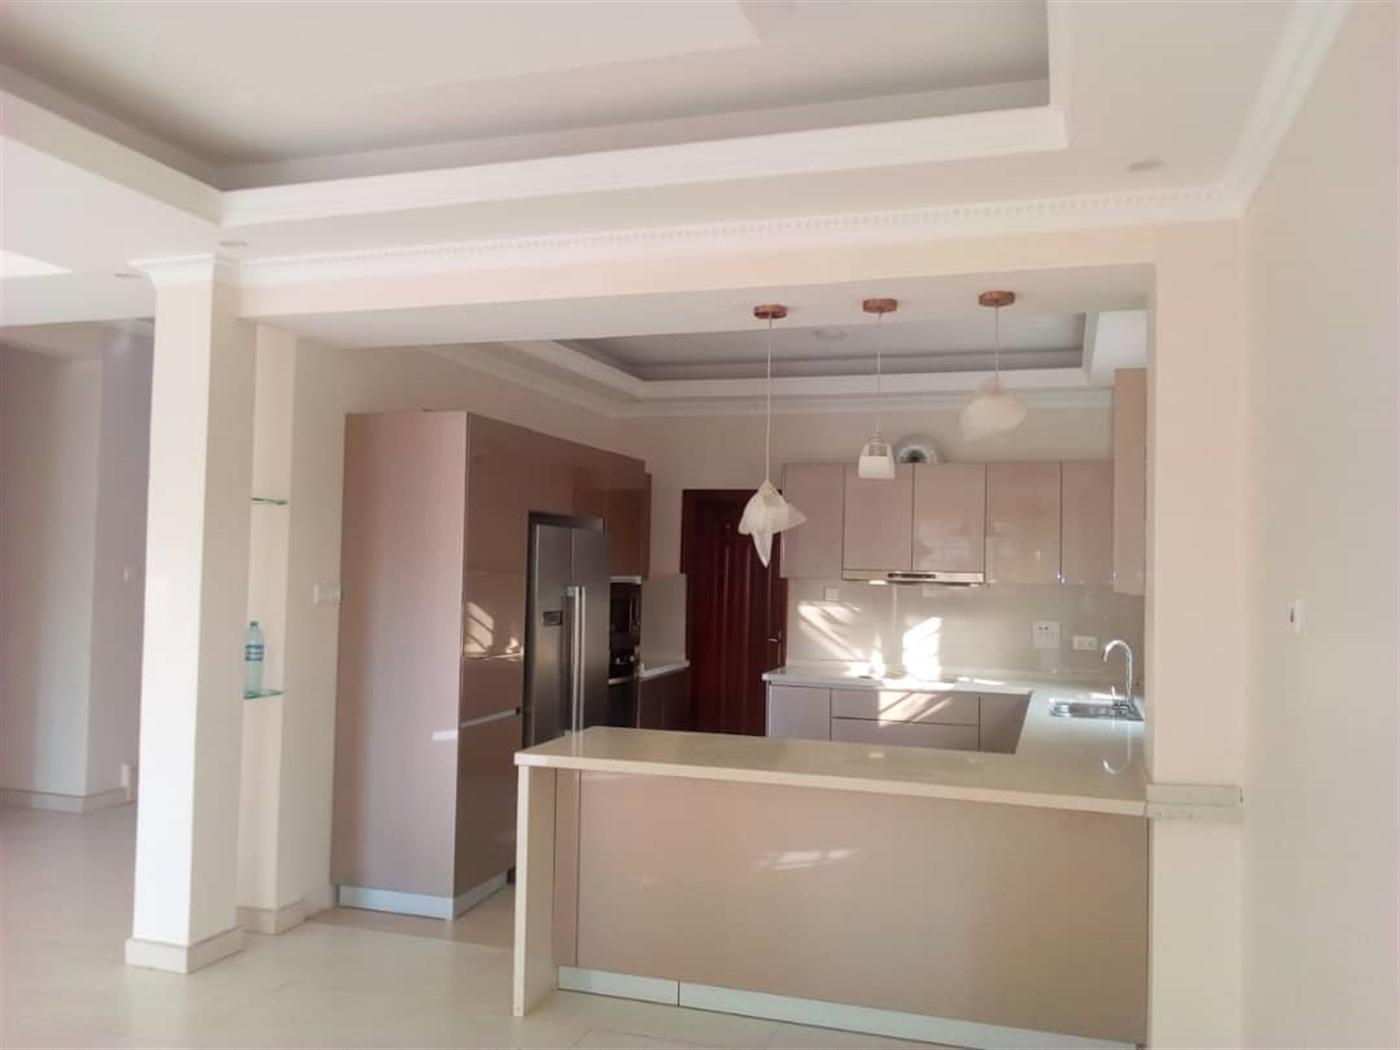 Storyed house for sale in Nsambya Kampala